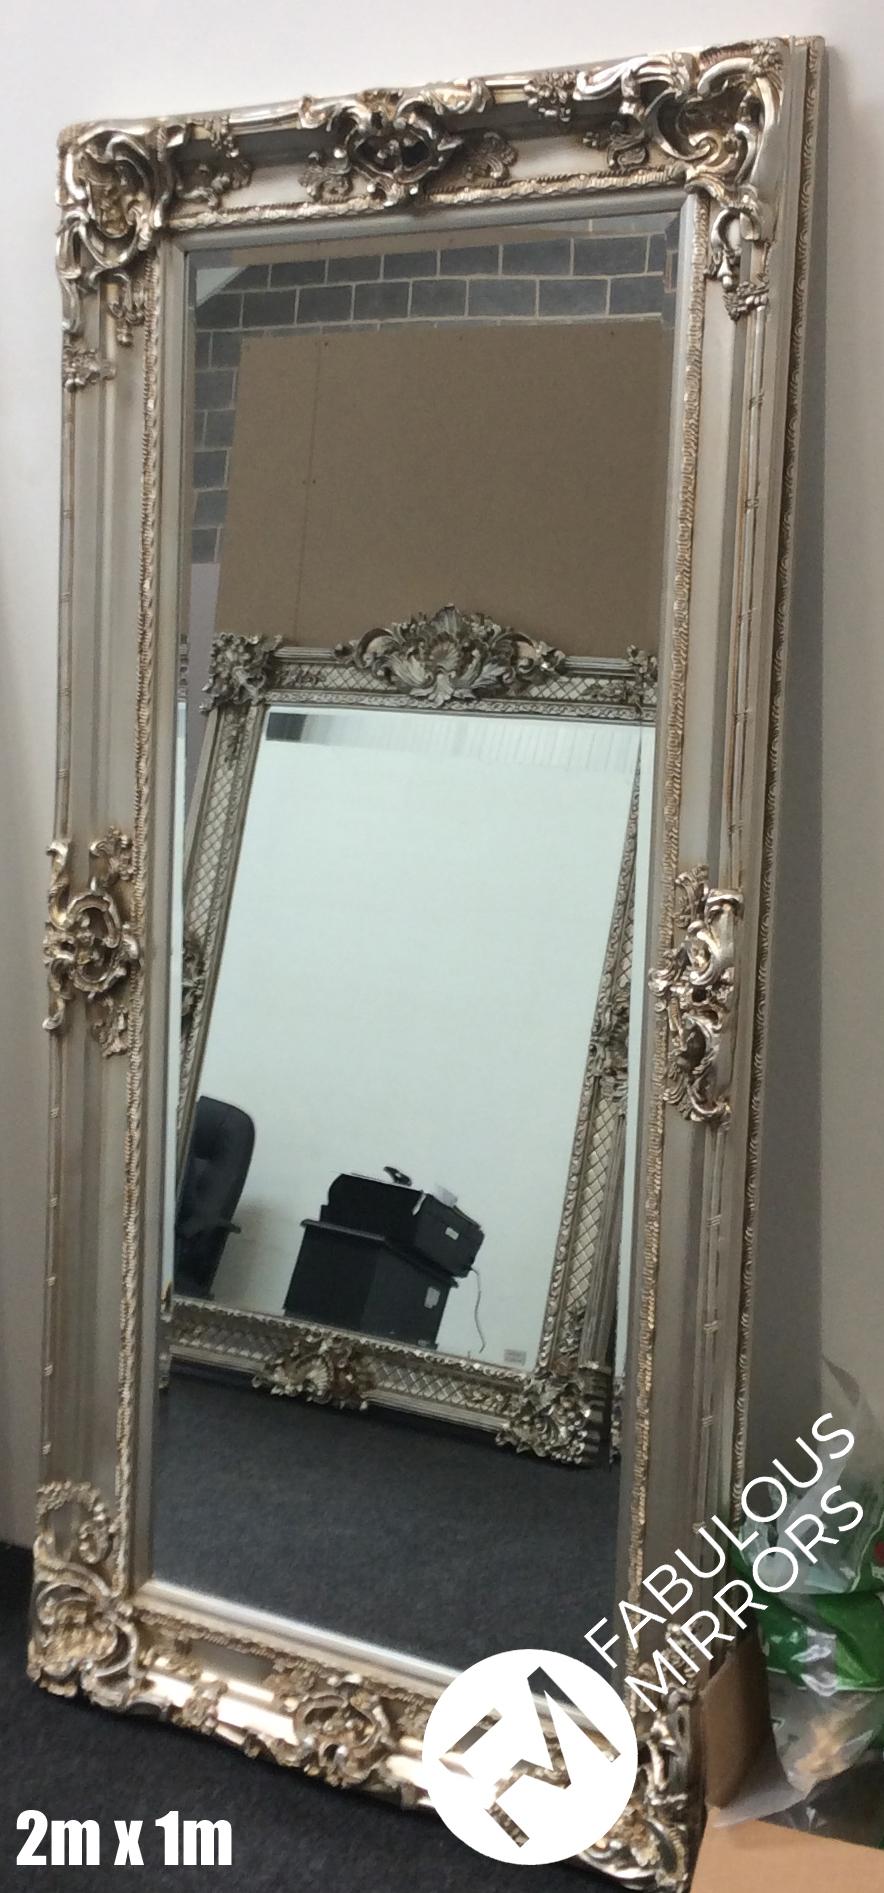 Large Stunning Antique Silver Decorative Ornate Beveled